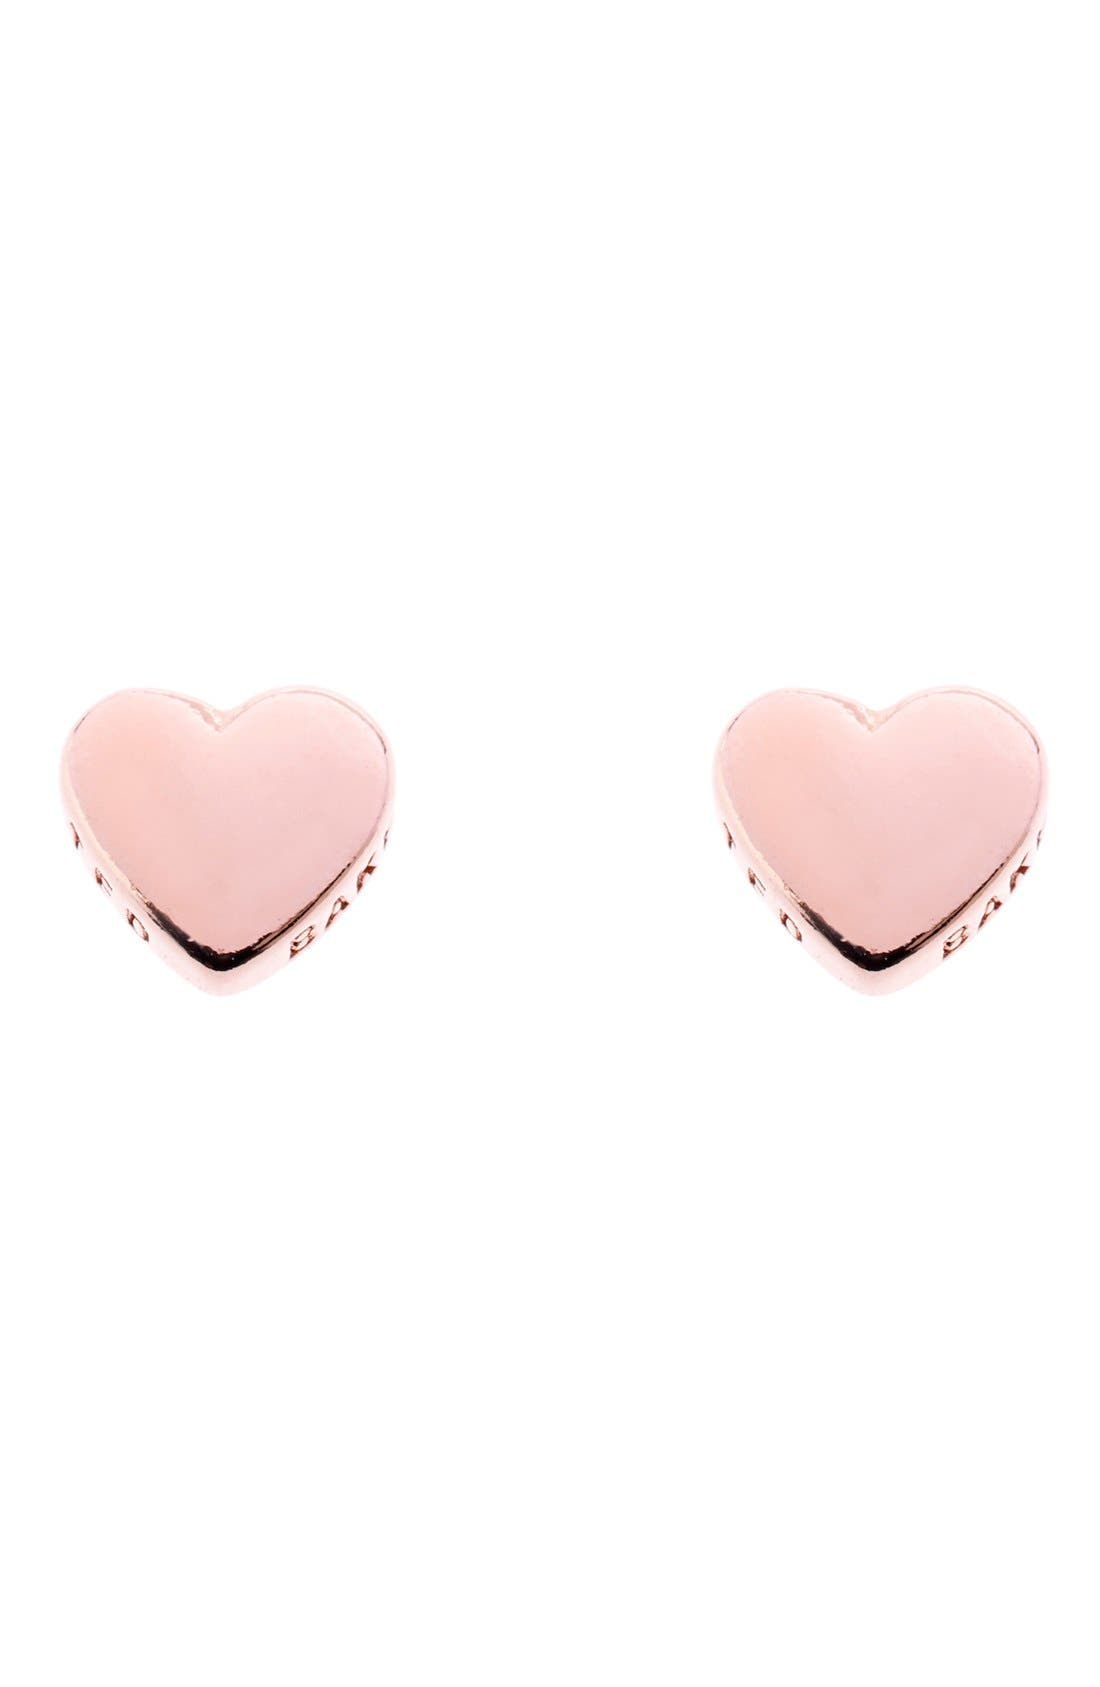 Alternate Image 1 Selected - Ted Baker London 'Tiny Heart' Stud Earrings